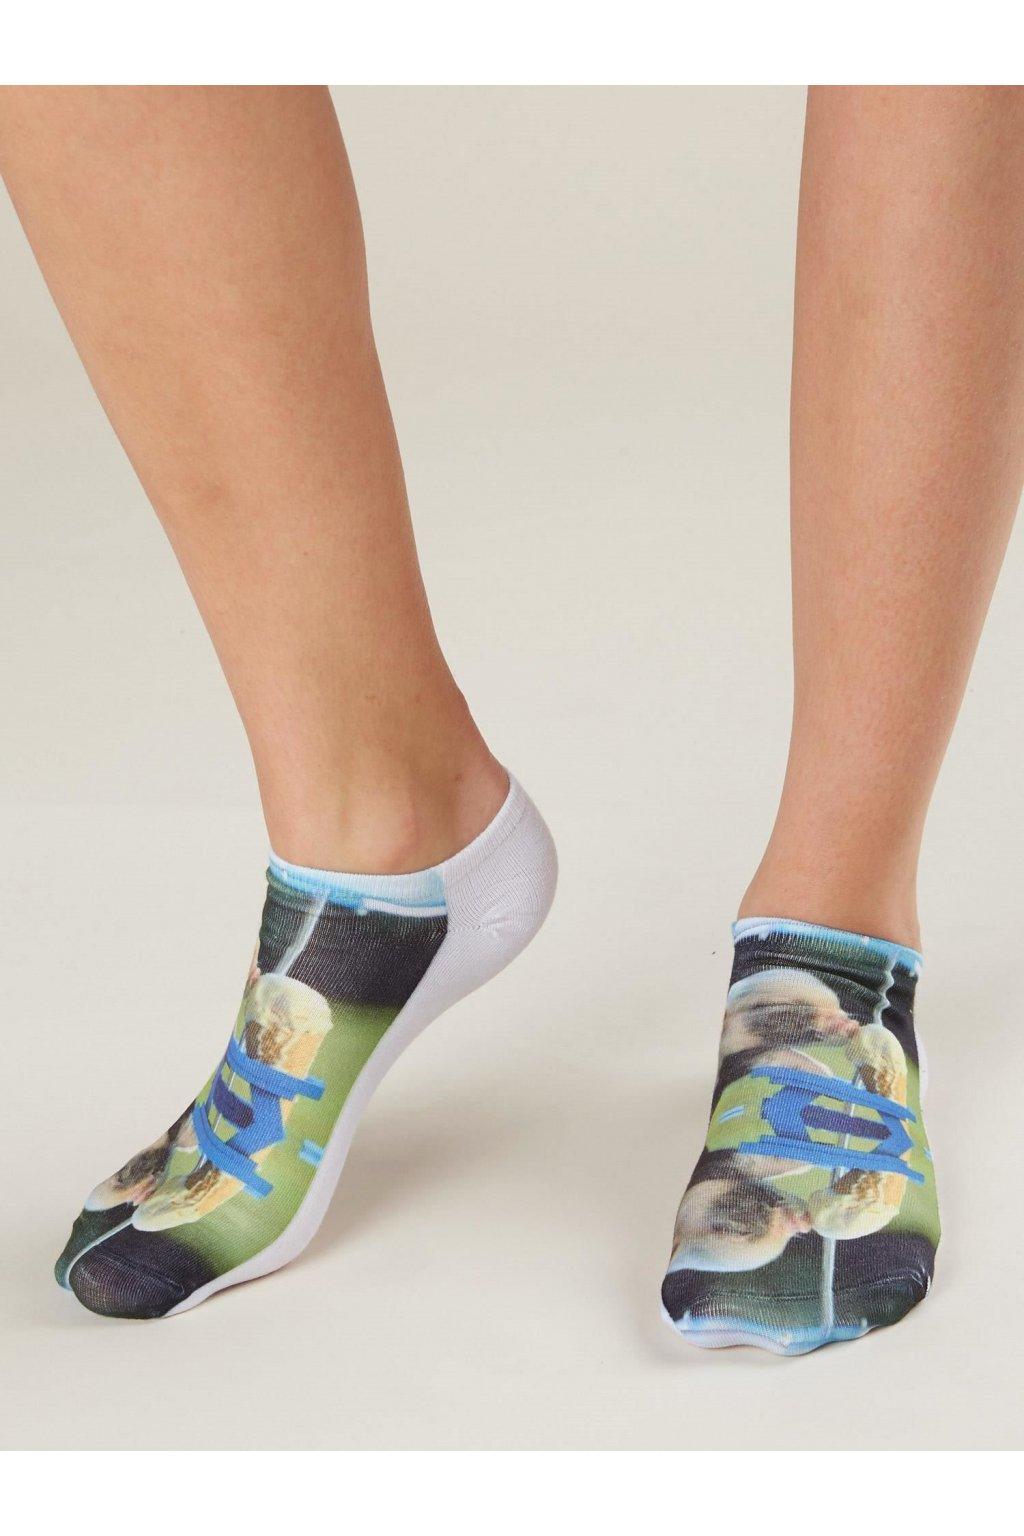 Dámske ponožky kód 7-SR-PWF-01593-5